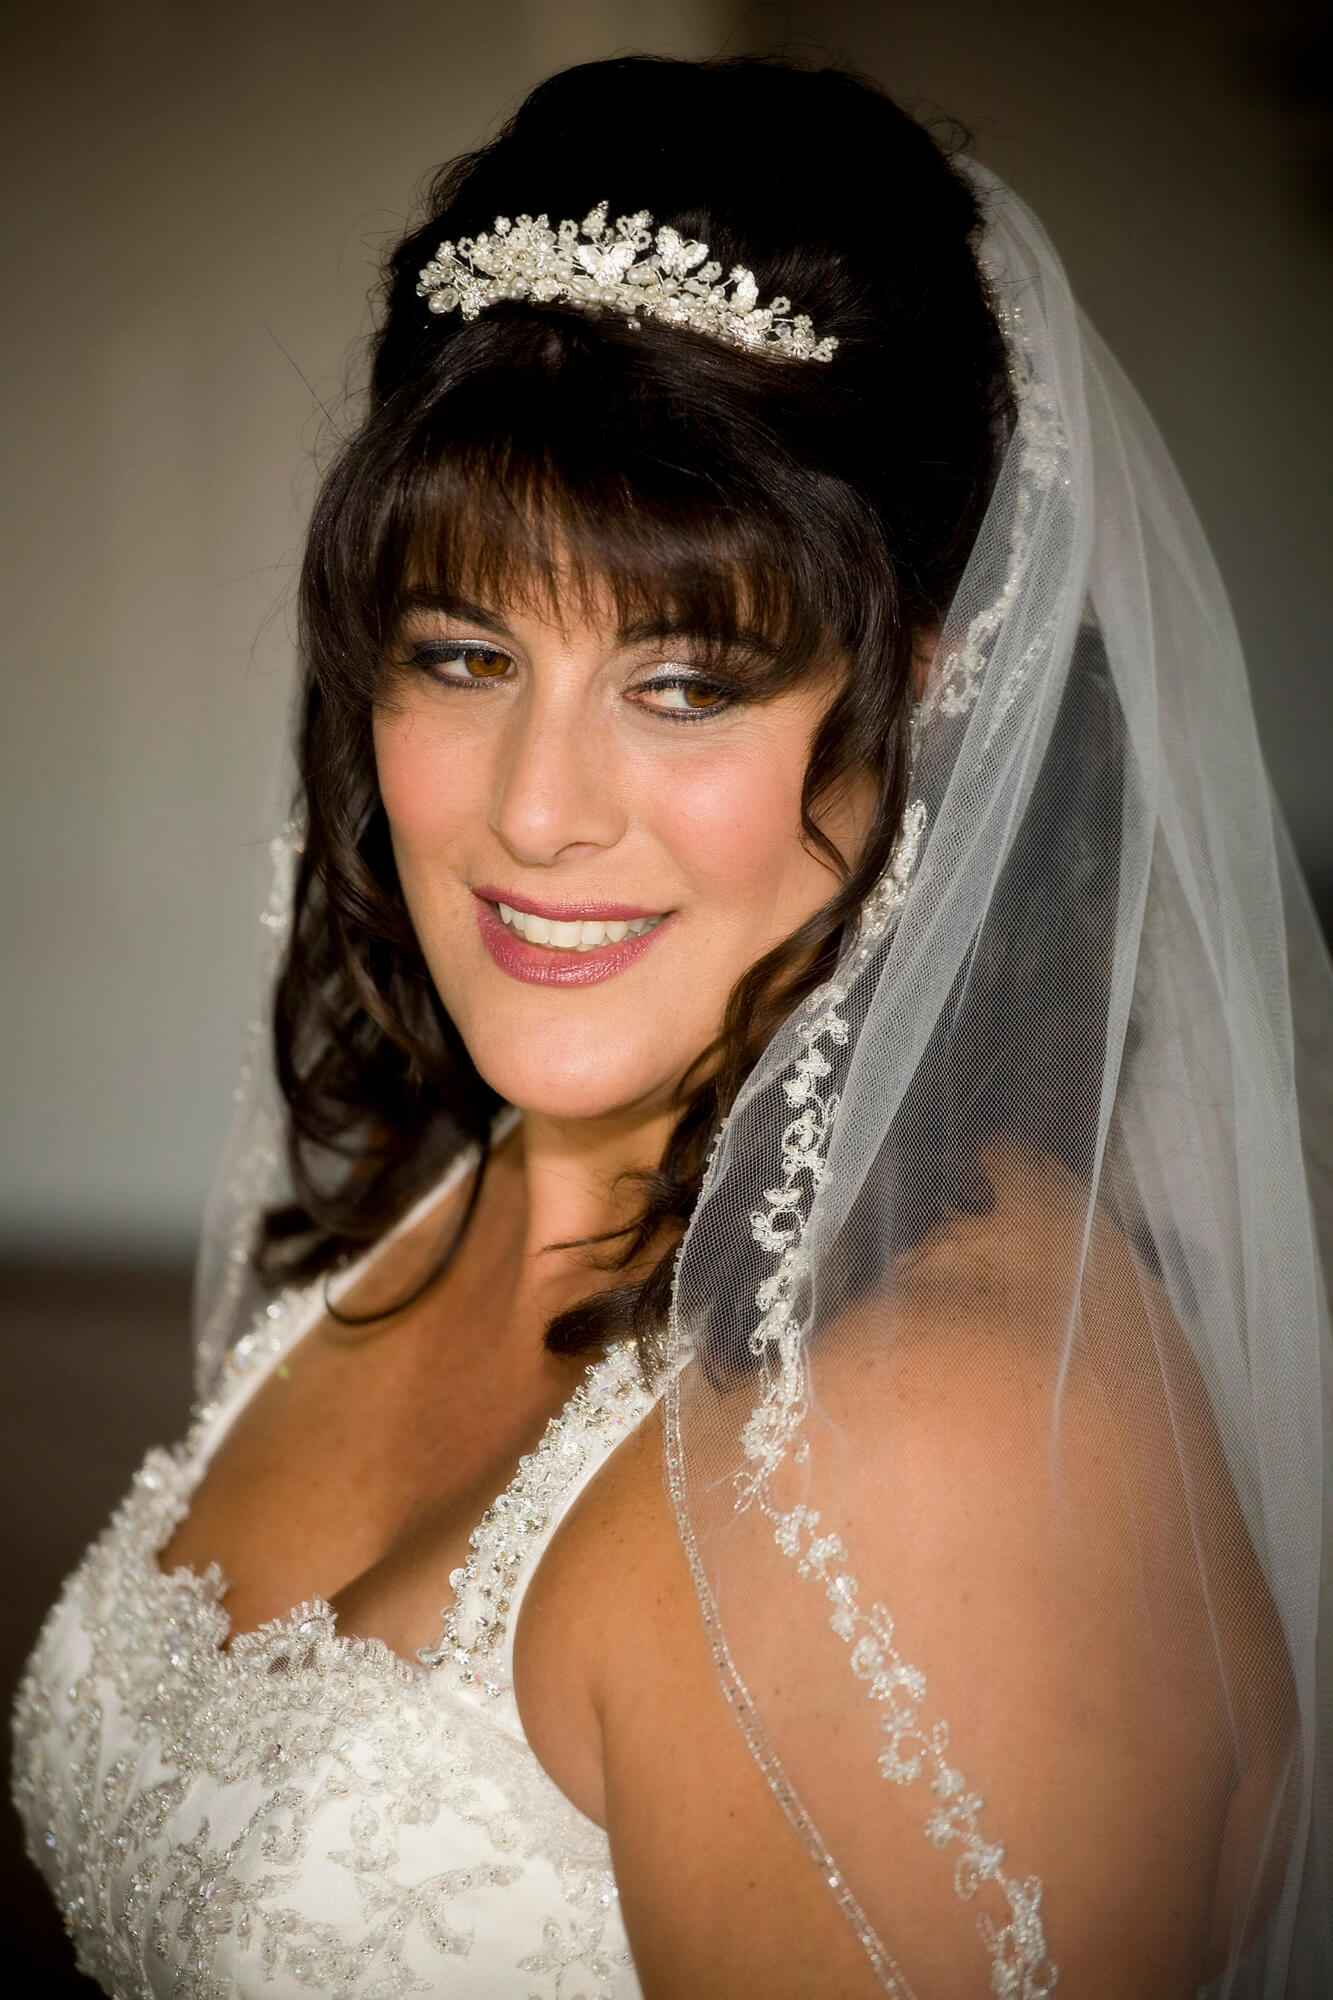 The Decorated Bride - Erika 16.jpg